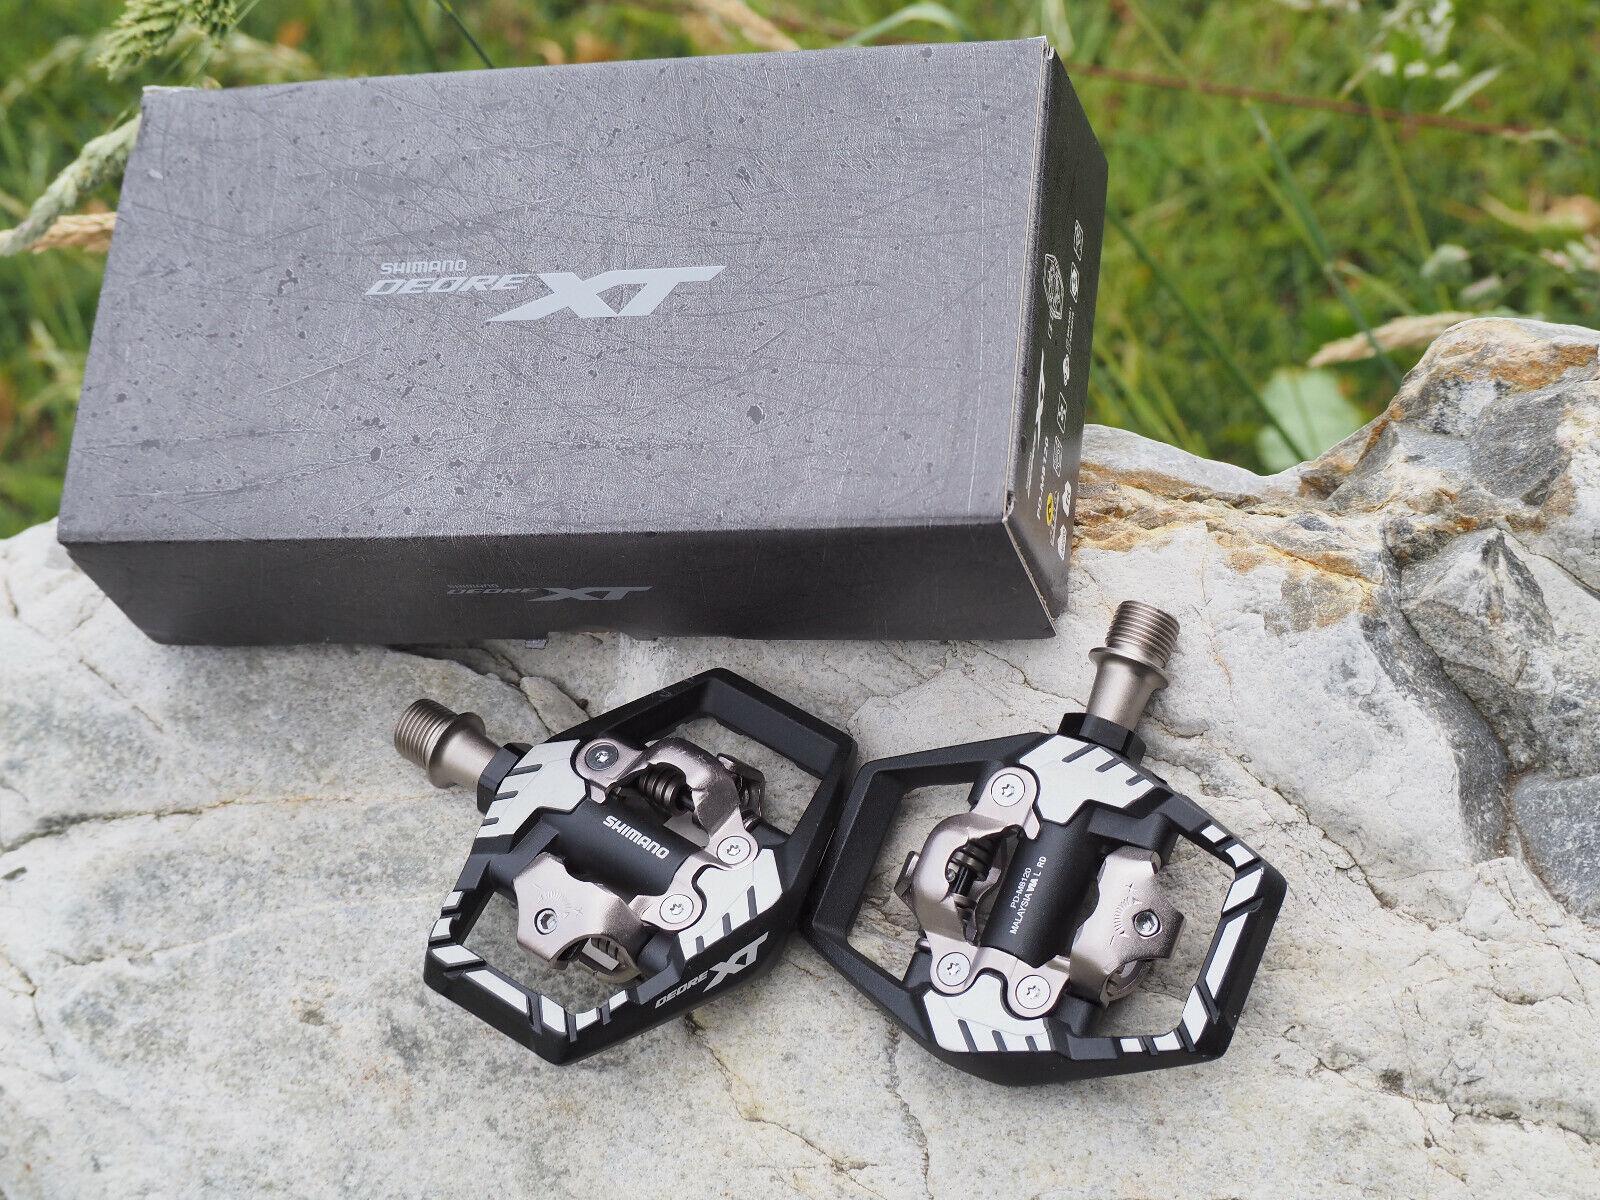 Shimano xt pedal PD-m 8120 pedal de clic MTB mountainbike bicicleta pedales 2020